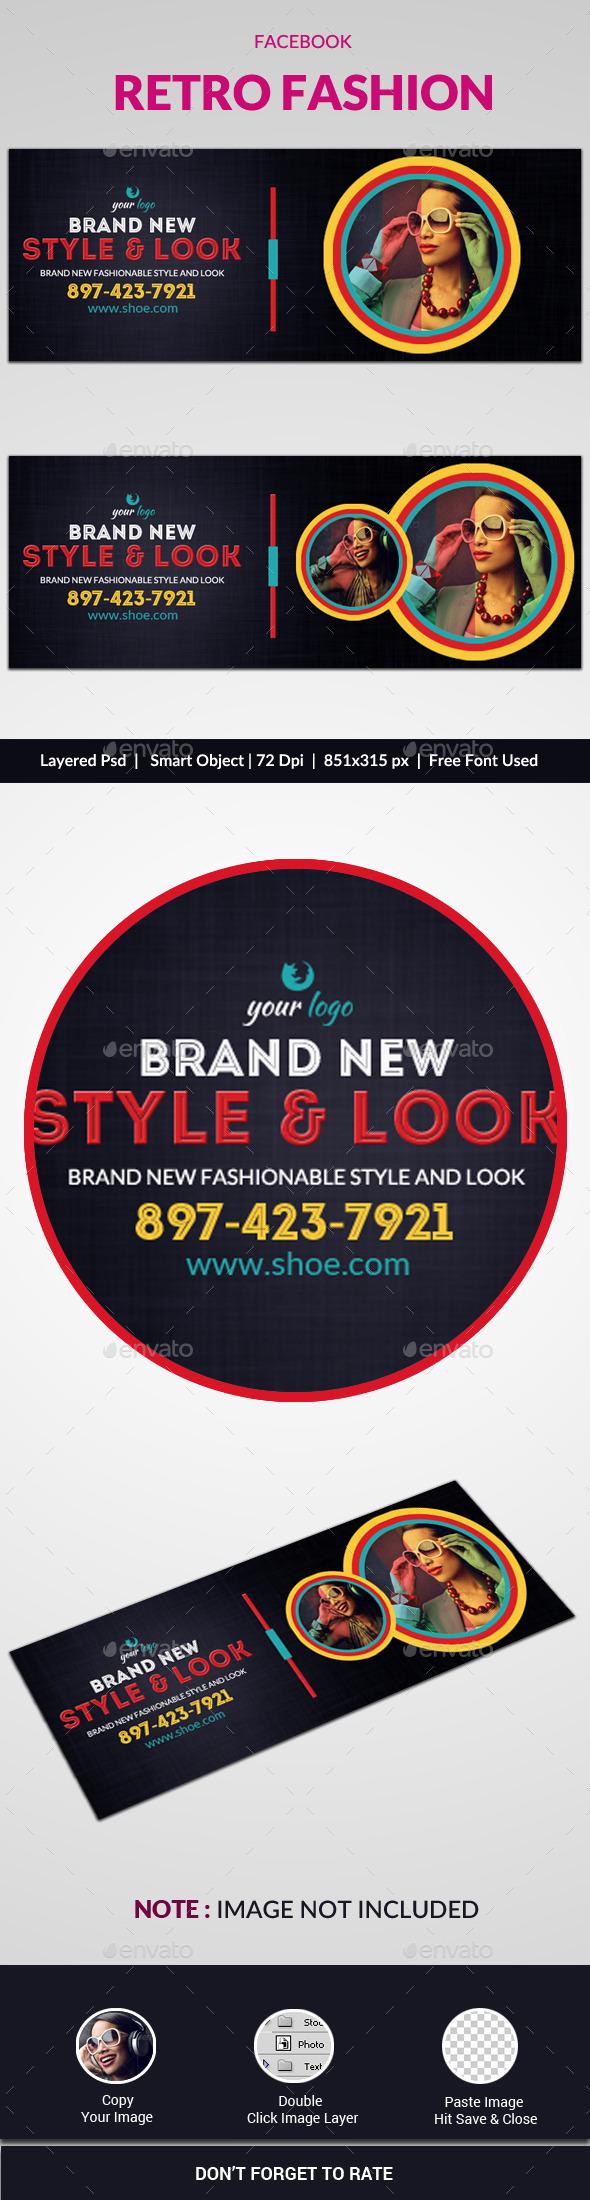 Retro Fashion Facebook Cover